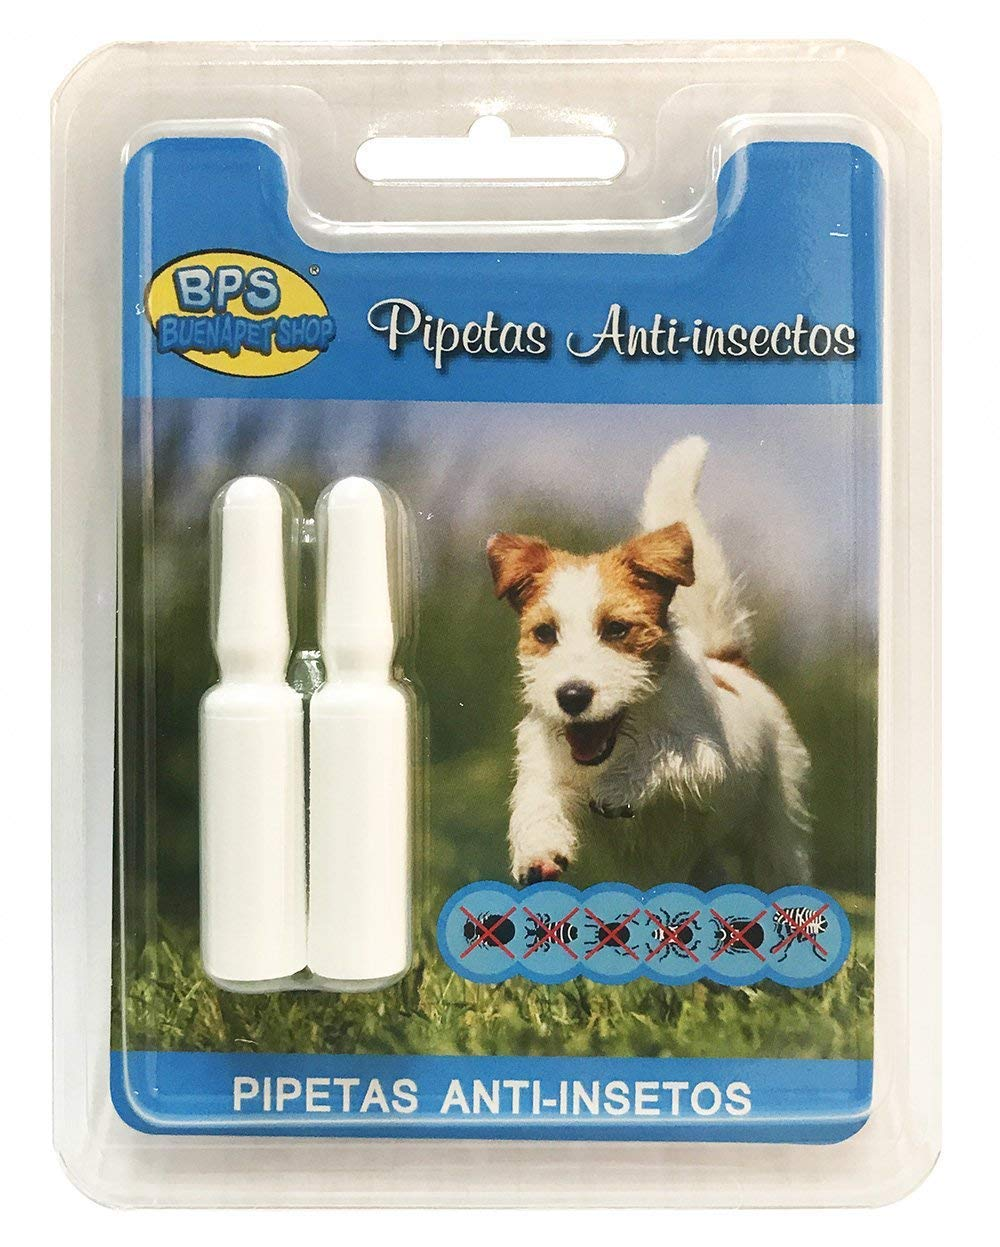 BPS Pipetas Repelentes para Perros Gatos Mascotas Antiparasitos Material Naturales (para Gato) BPS-4003: Amazon.es: Productos para mascotas